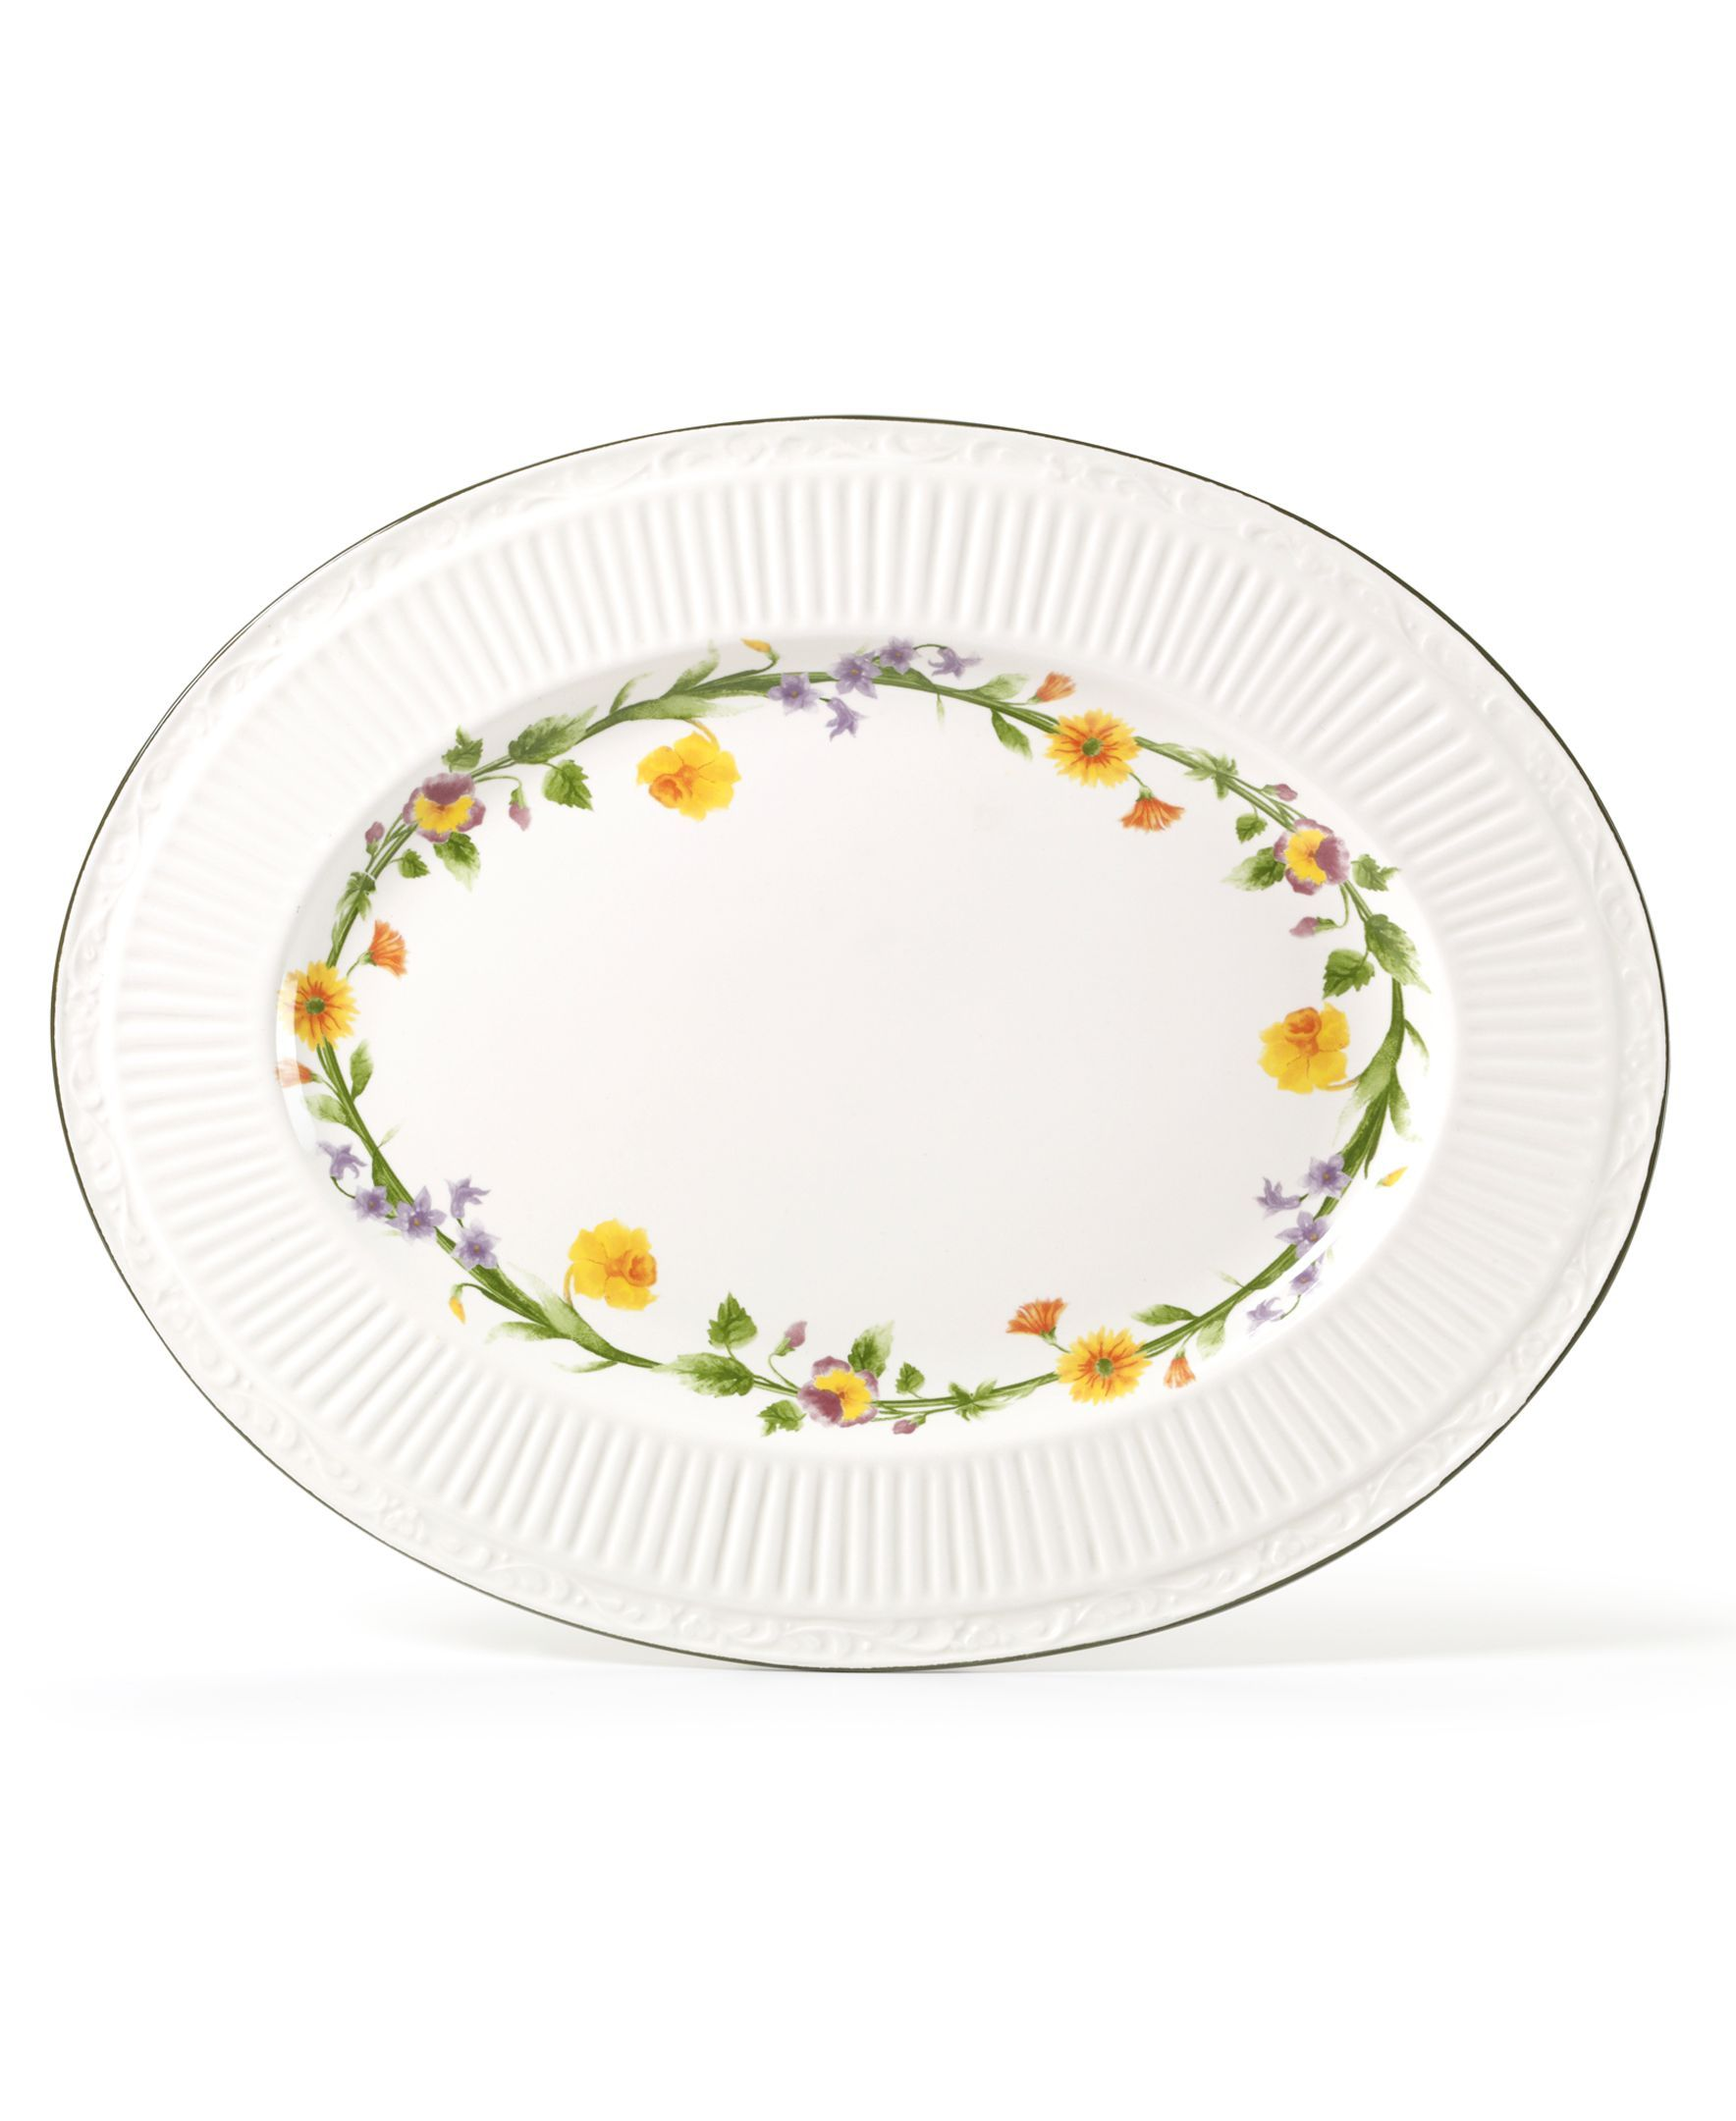 Mikasa Dinnerware, Italian Meadow Oval Platter